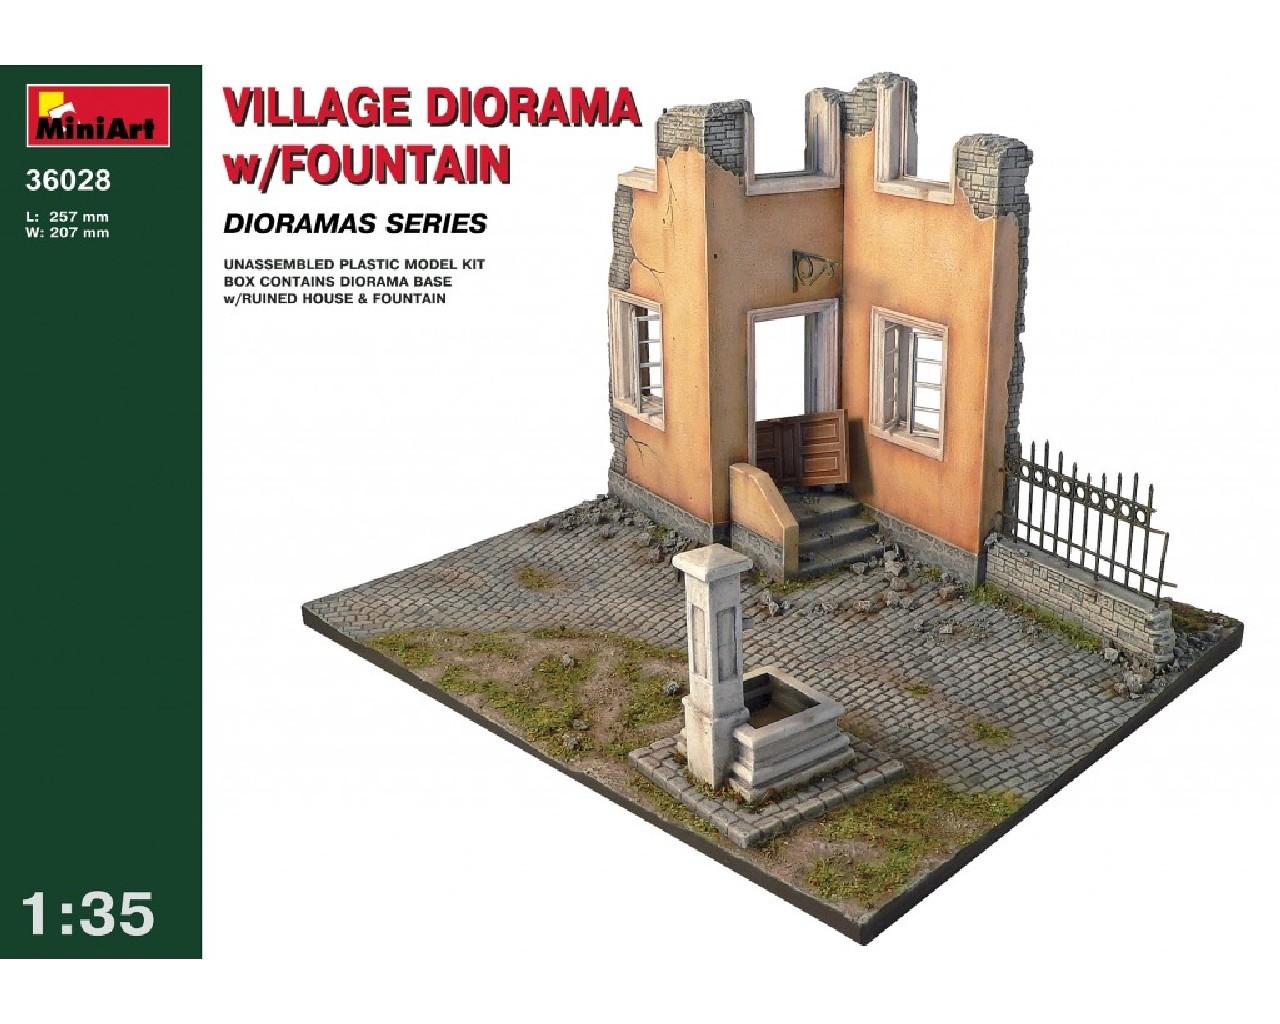 1/35 Village Diorama w/Fountain